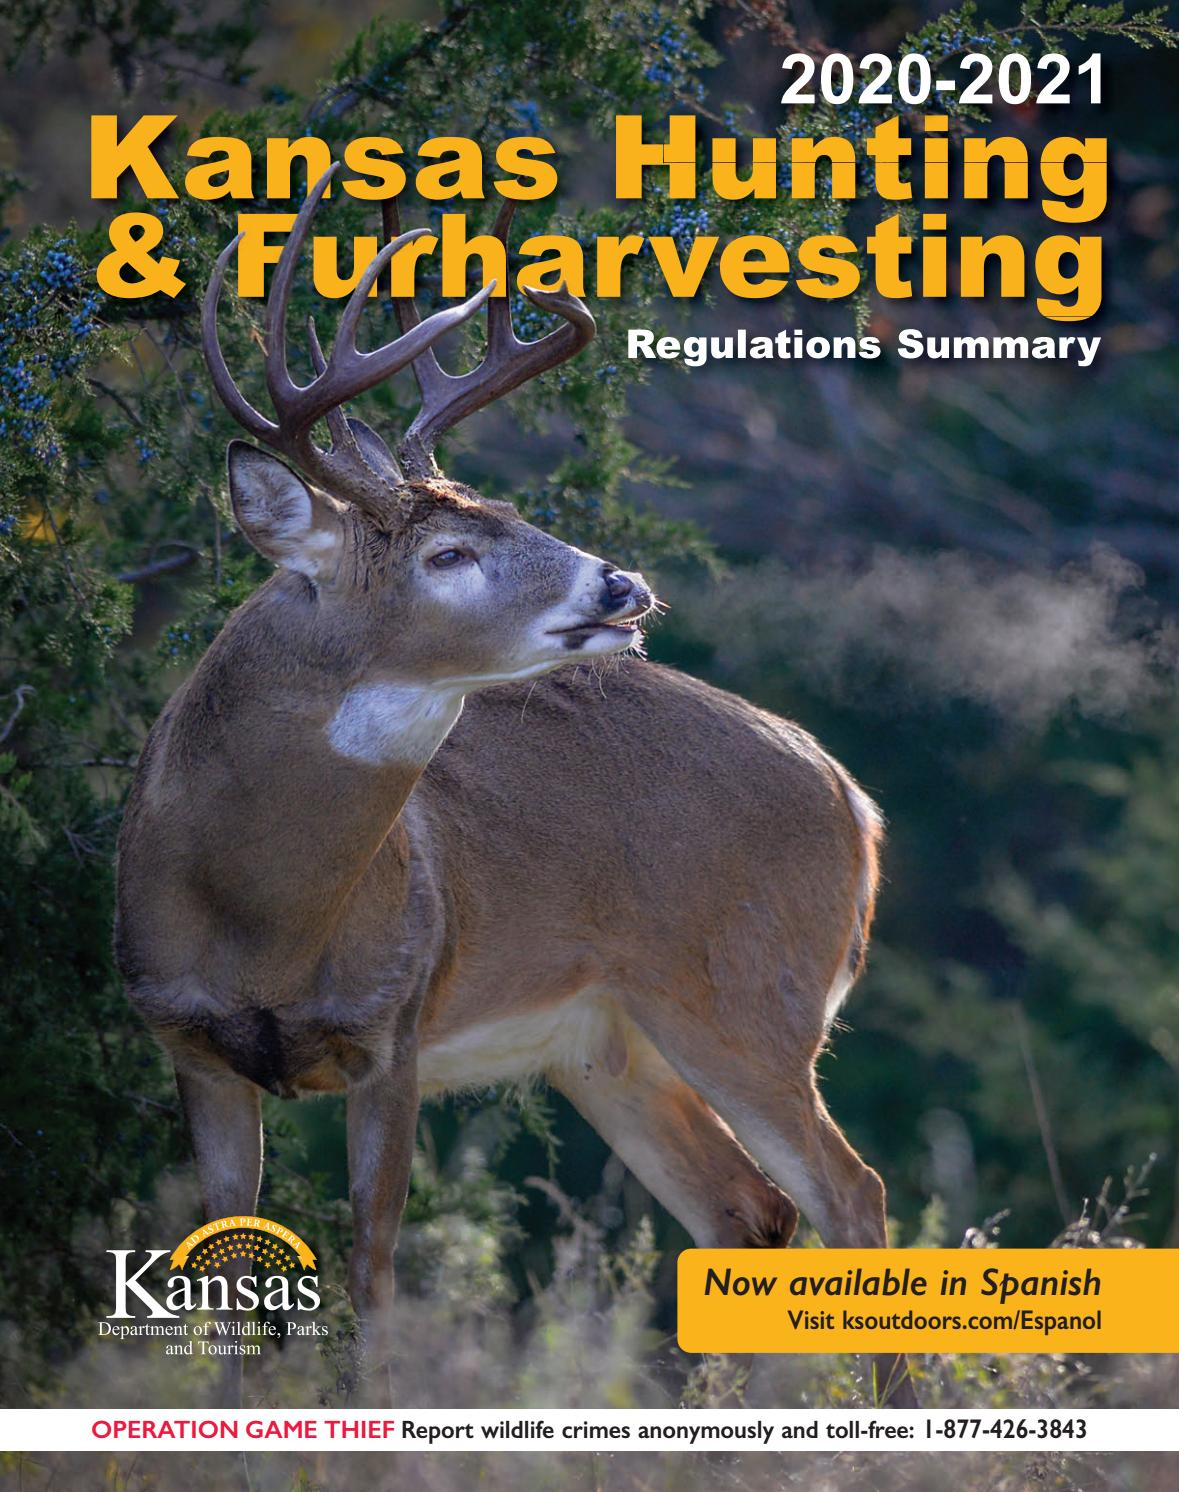 2020-2021 Kansas Hunting & Furharvesting Regulations Summary with 2021 Whitetail Rut Calendar For Virginia